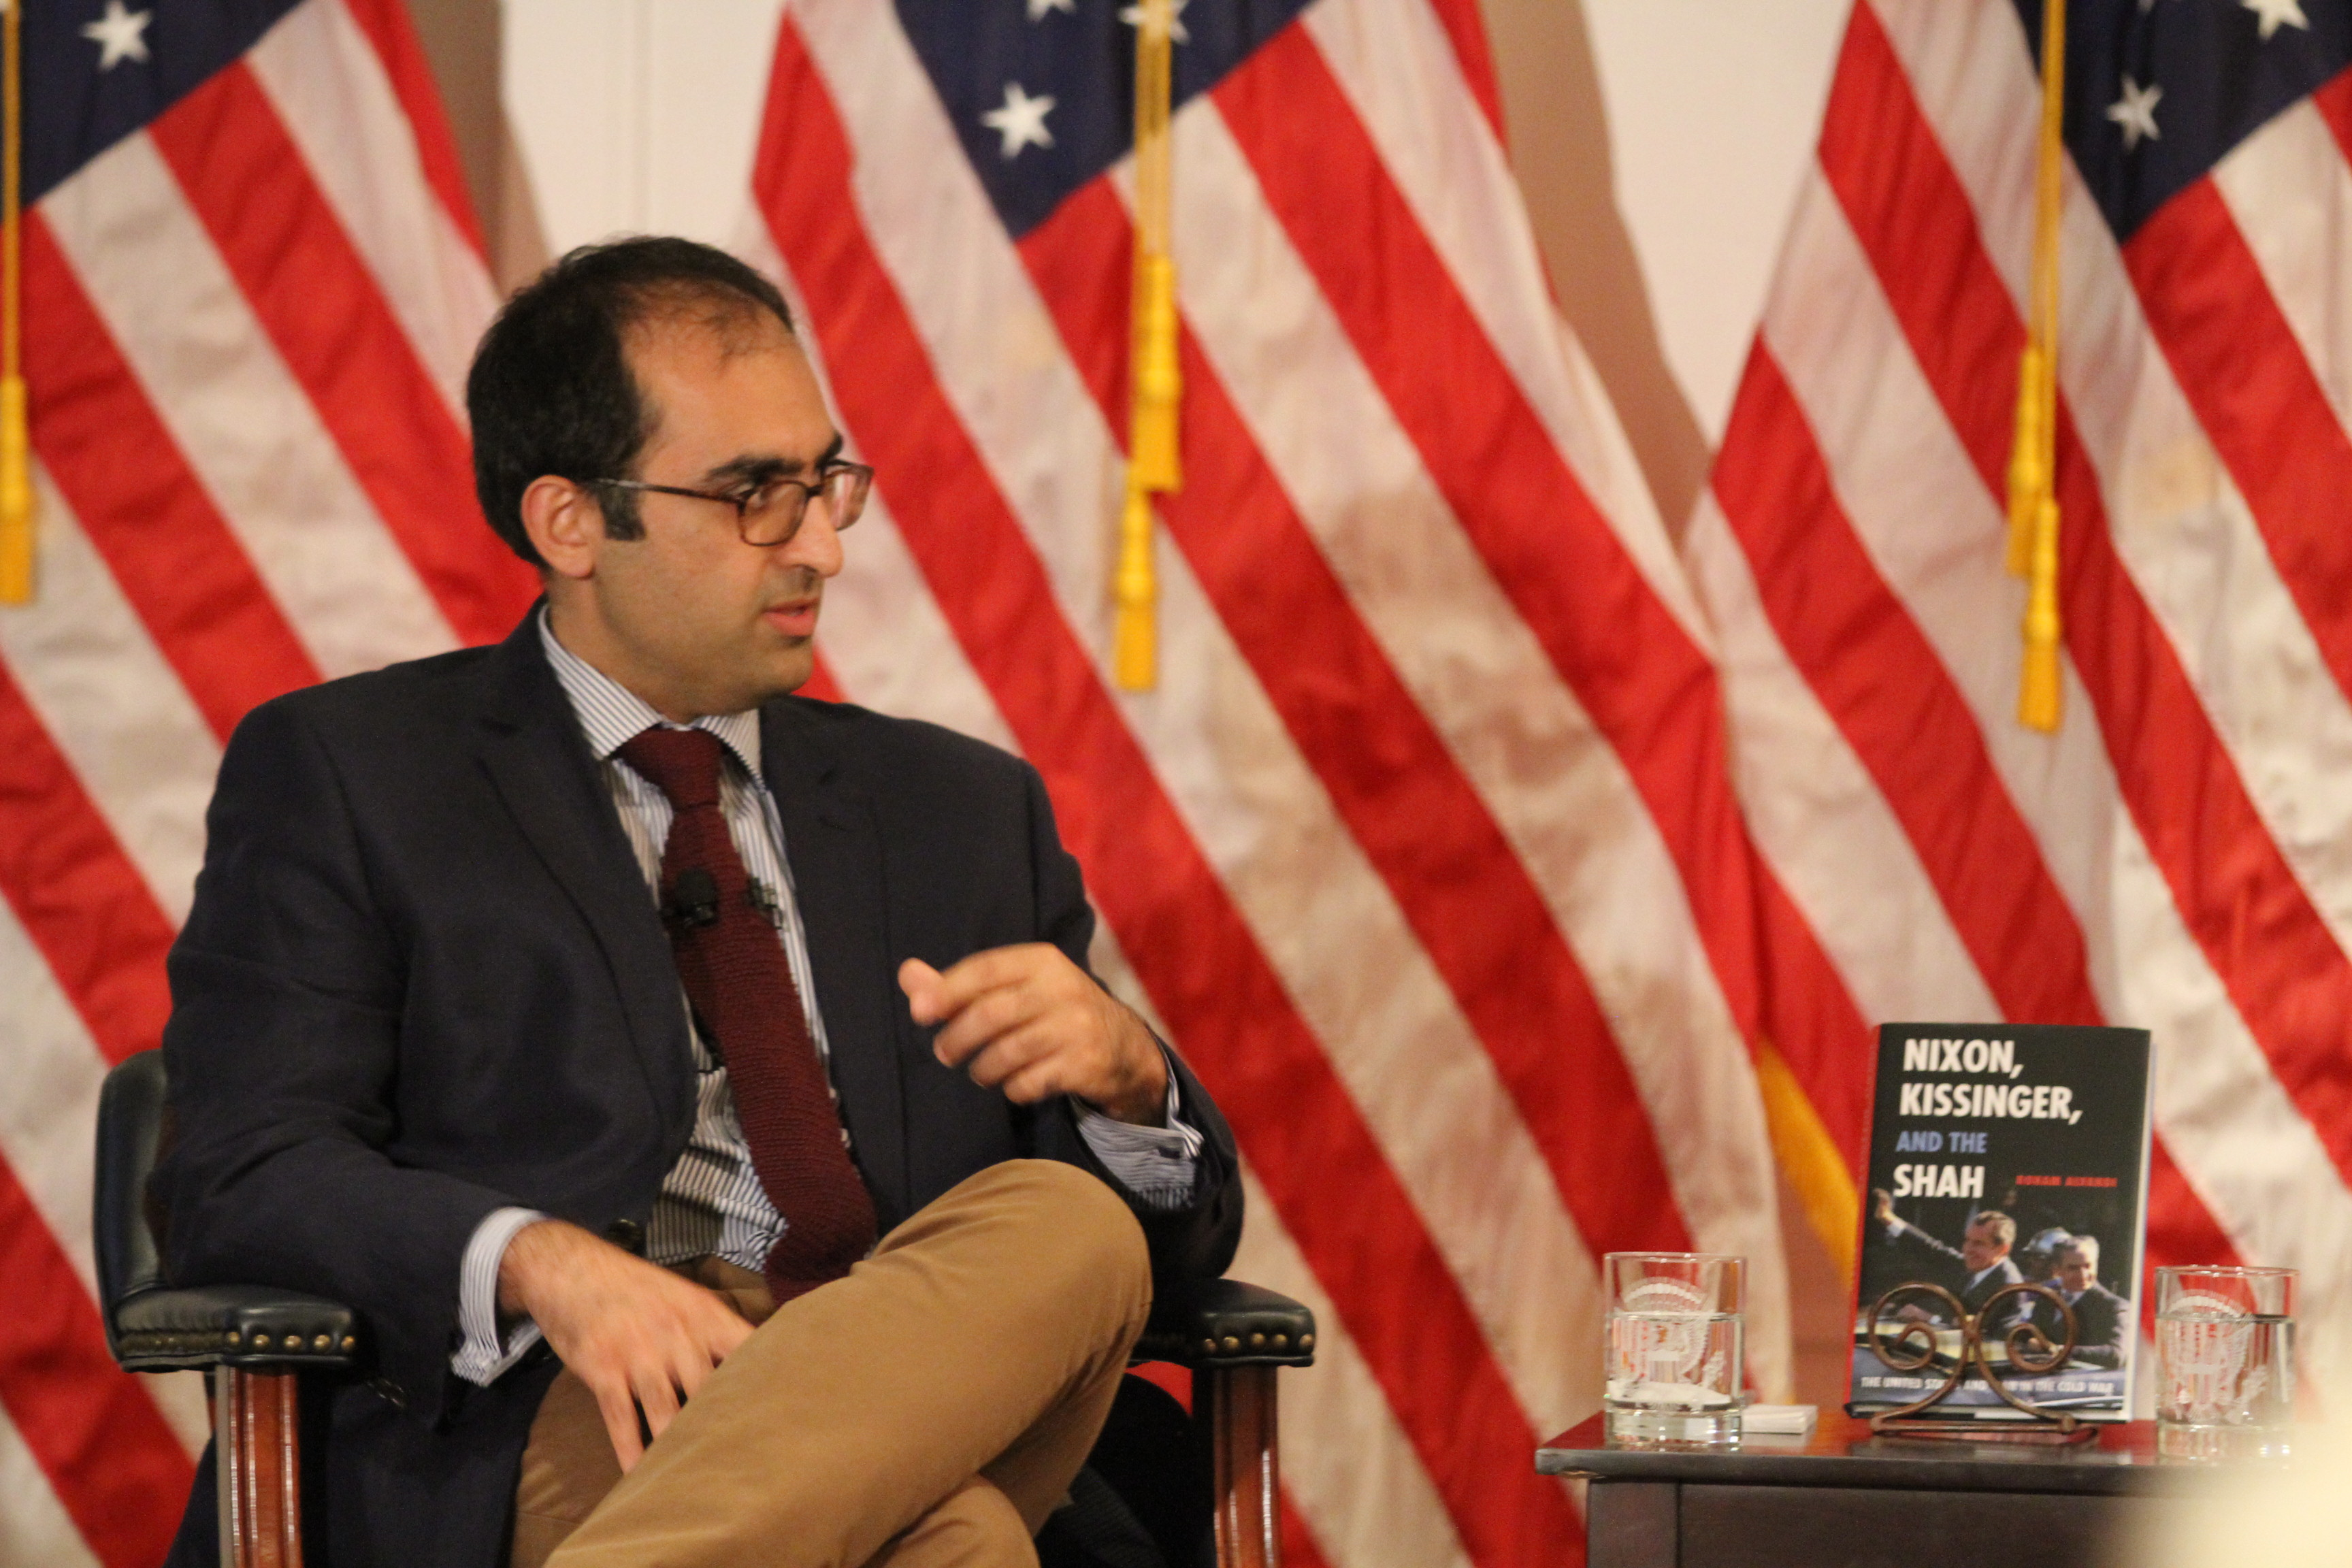 Video: Nixon, Kissinger, and the Shah with Roham Alvandi